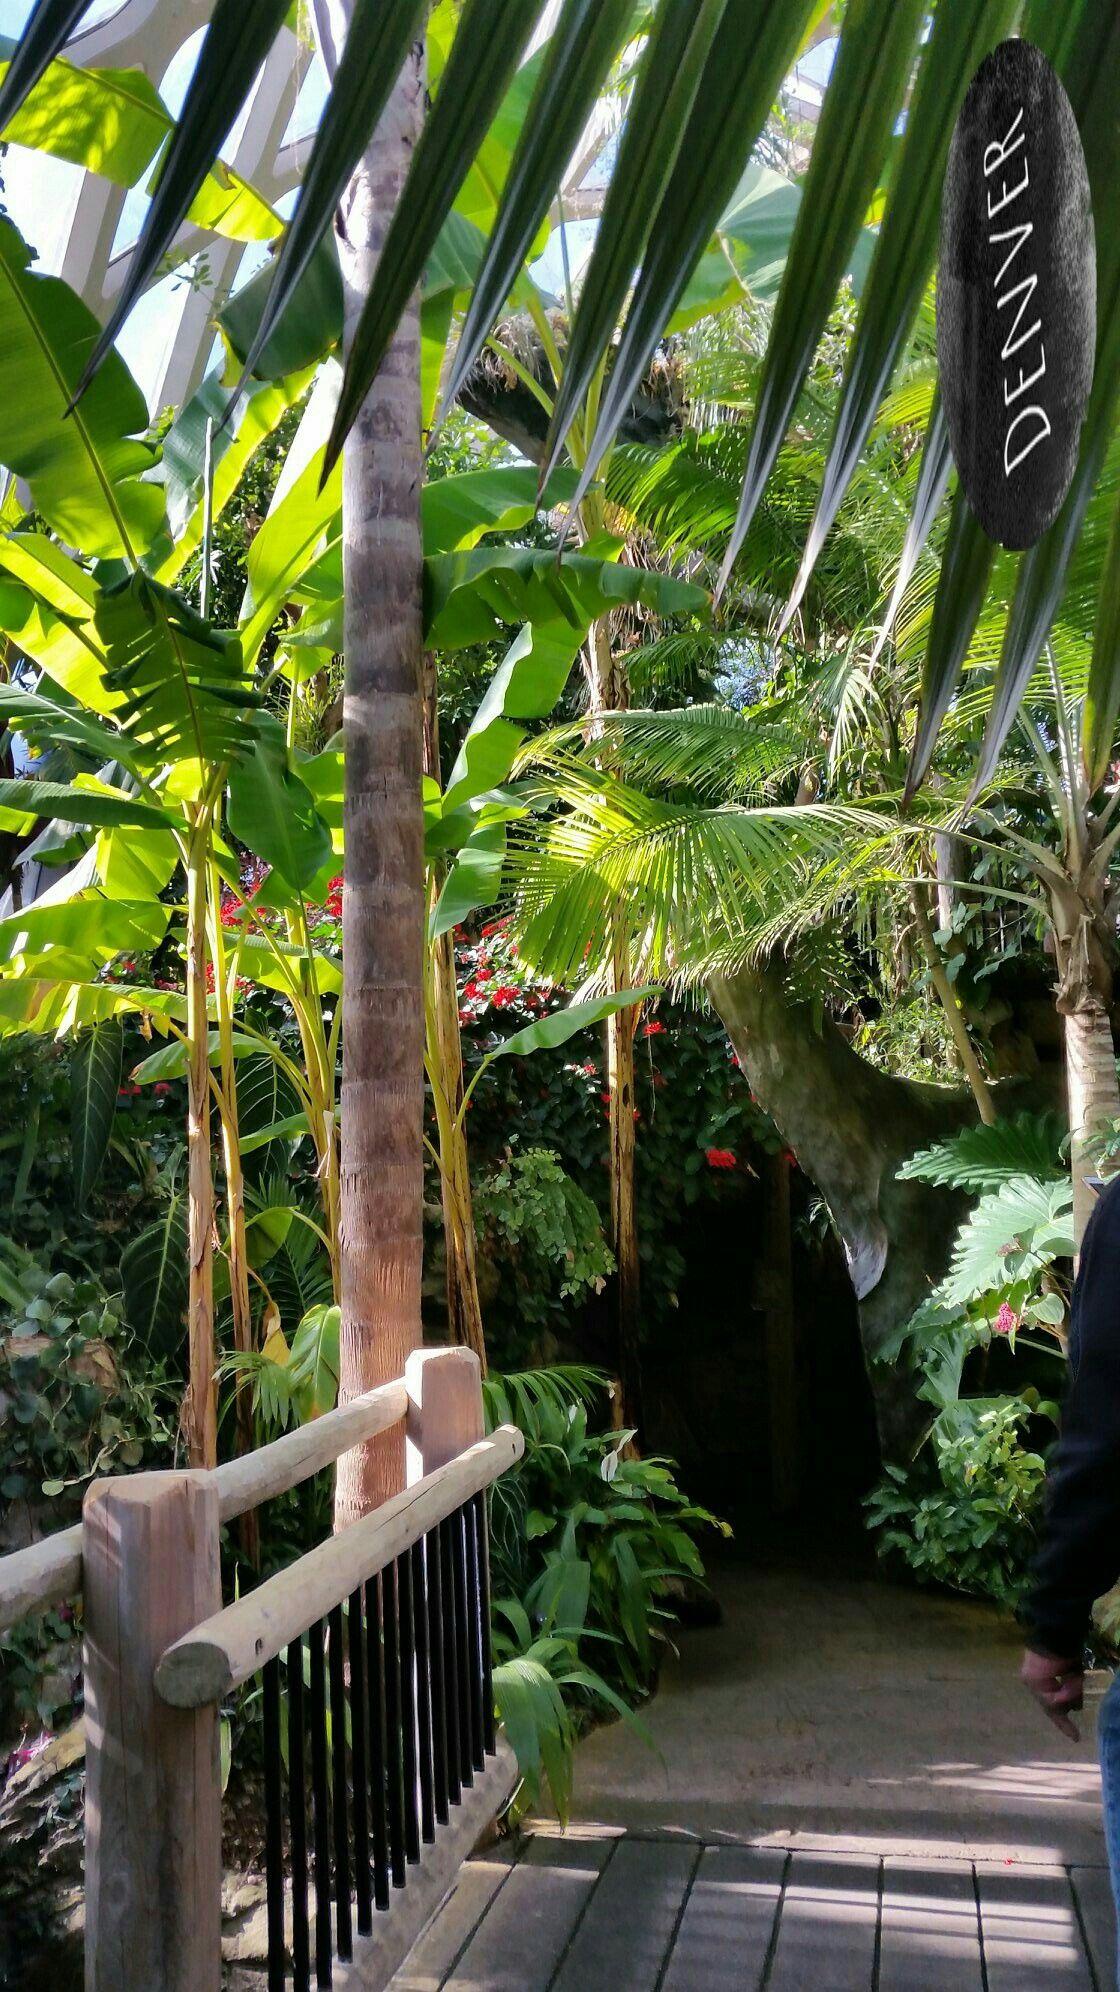 Lush Tropical Gardens under the dome at The Denver Botanical